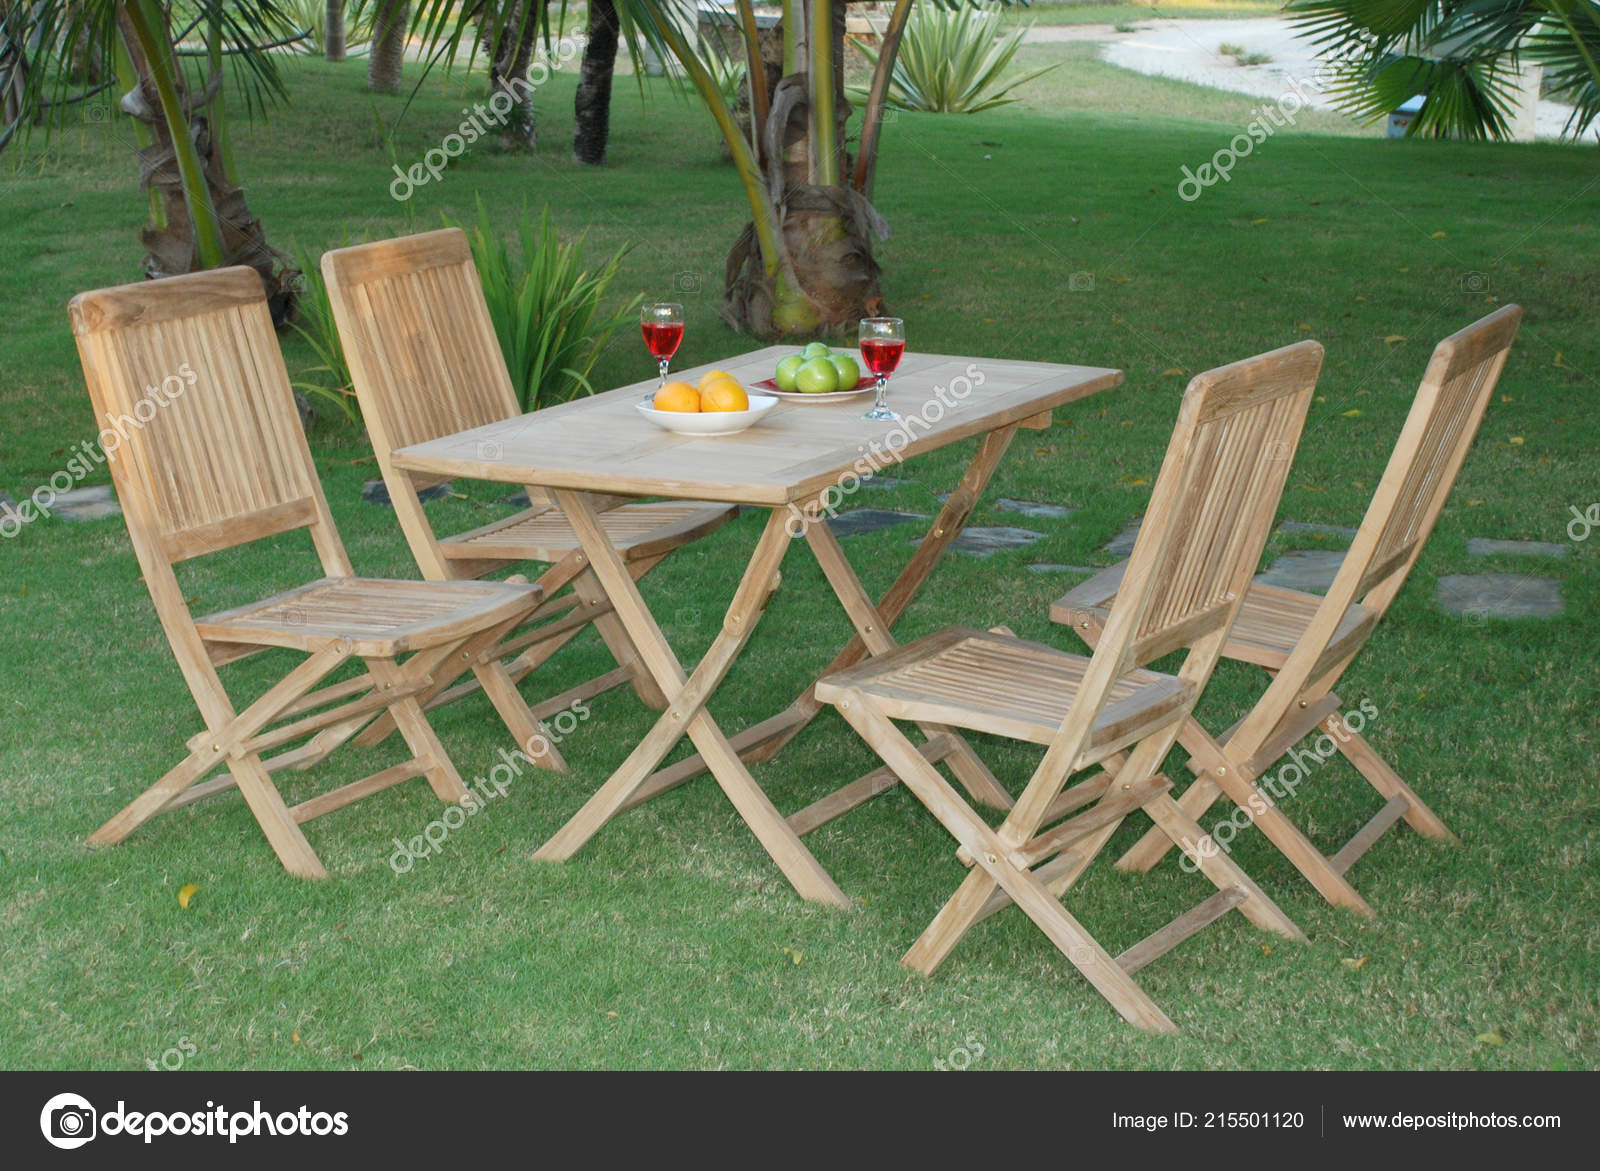 Teak Garden Furniture Outdoor Teak Garden Furniture Folding Chairs Table Stock Photo C Logonesia 215501120